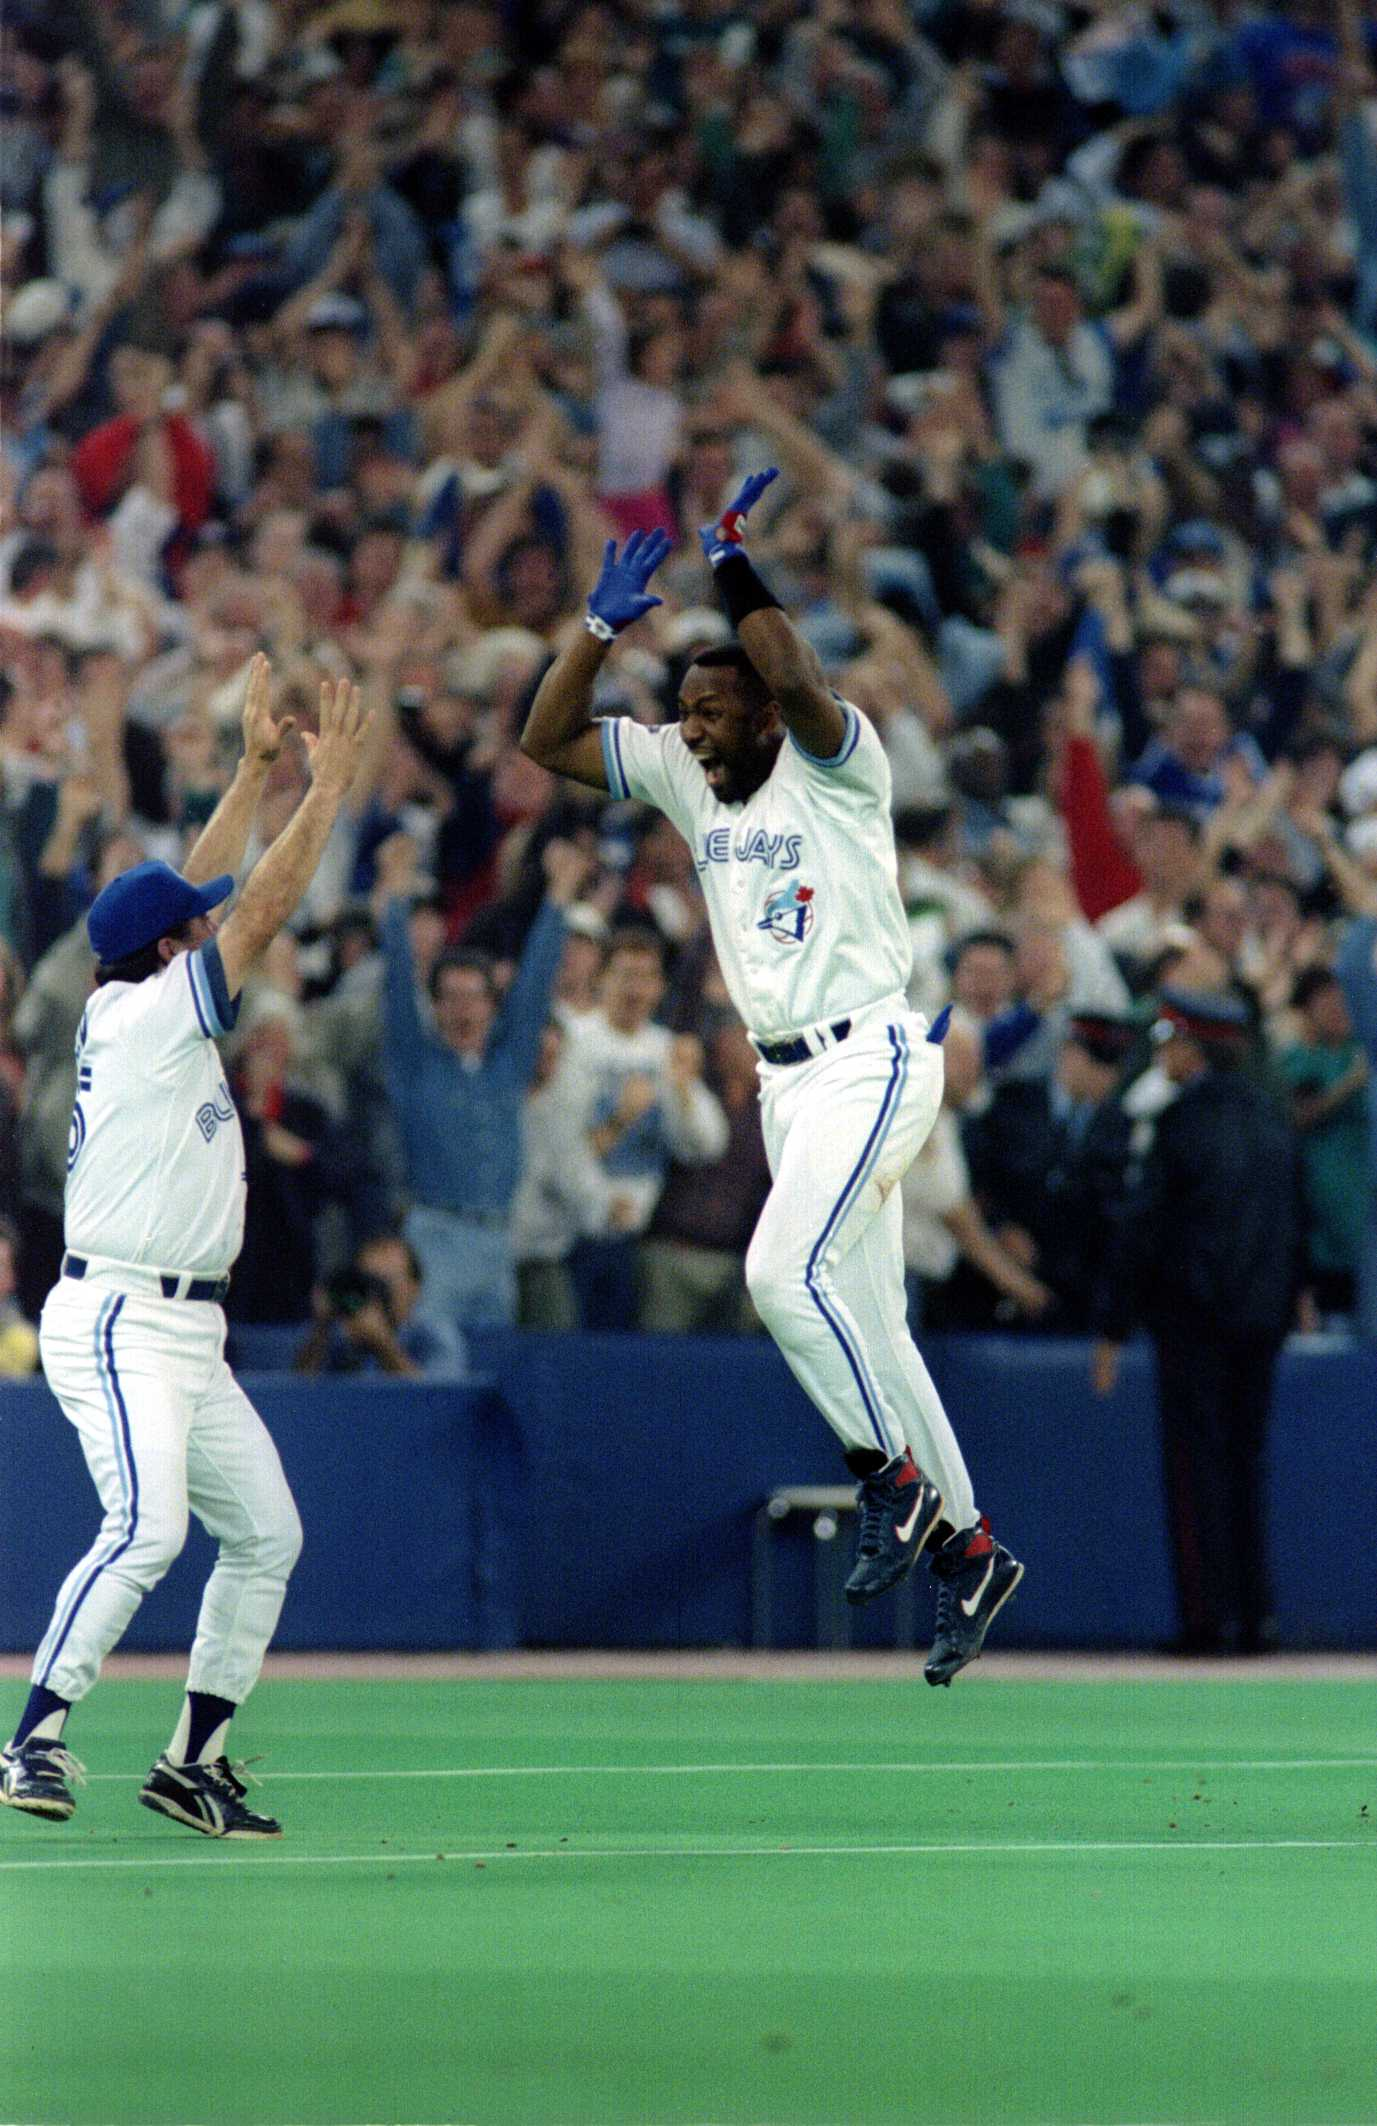 PICK ONE Toronto Philadelphia Carter 1993 World Series Tickets Game 1 2 3 4 6